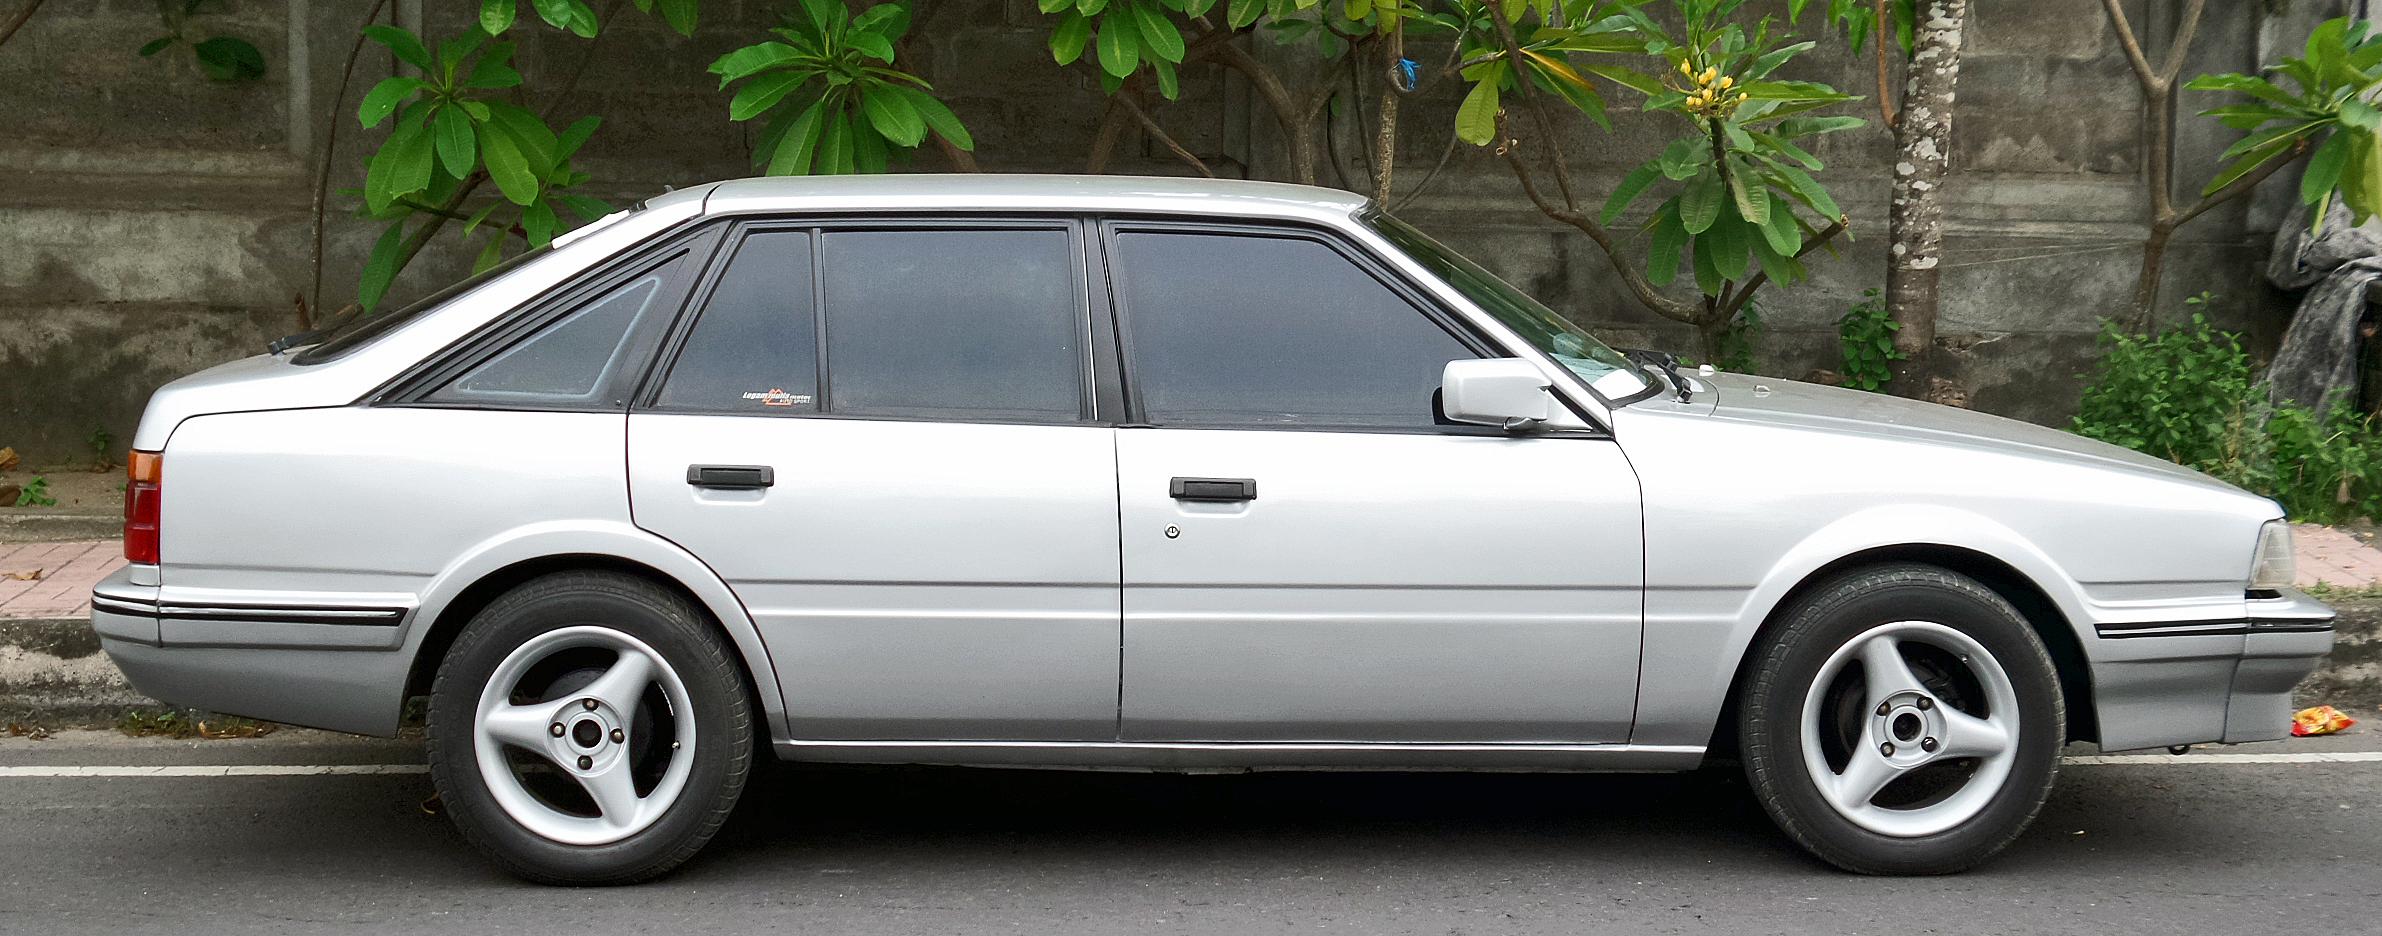 File:1986 Mazda 626 GLX (GC) hatchback (profile), wati.jpg ...